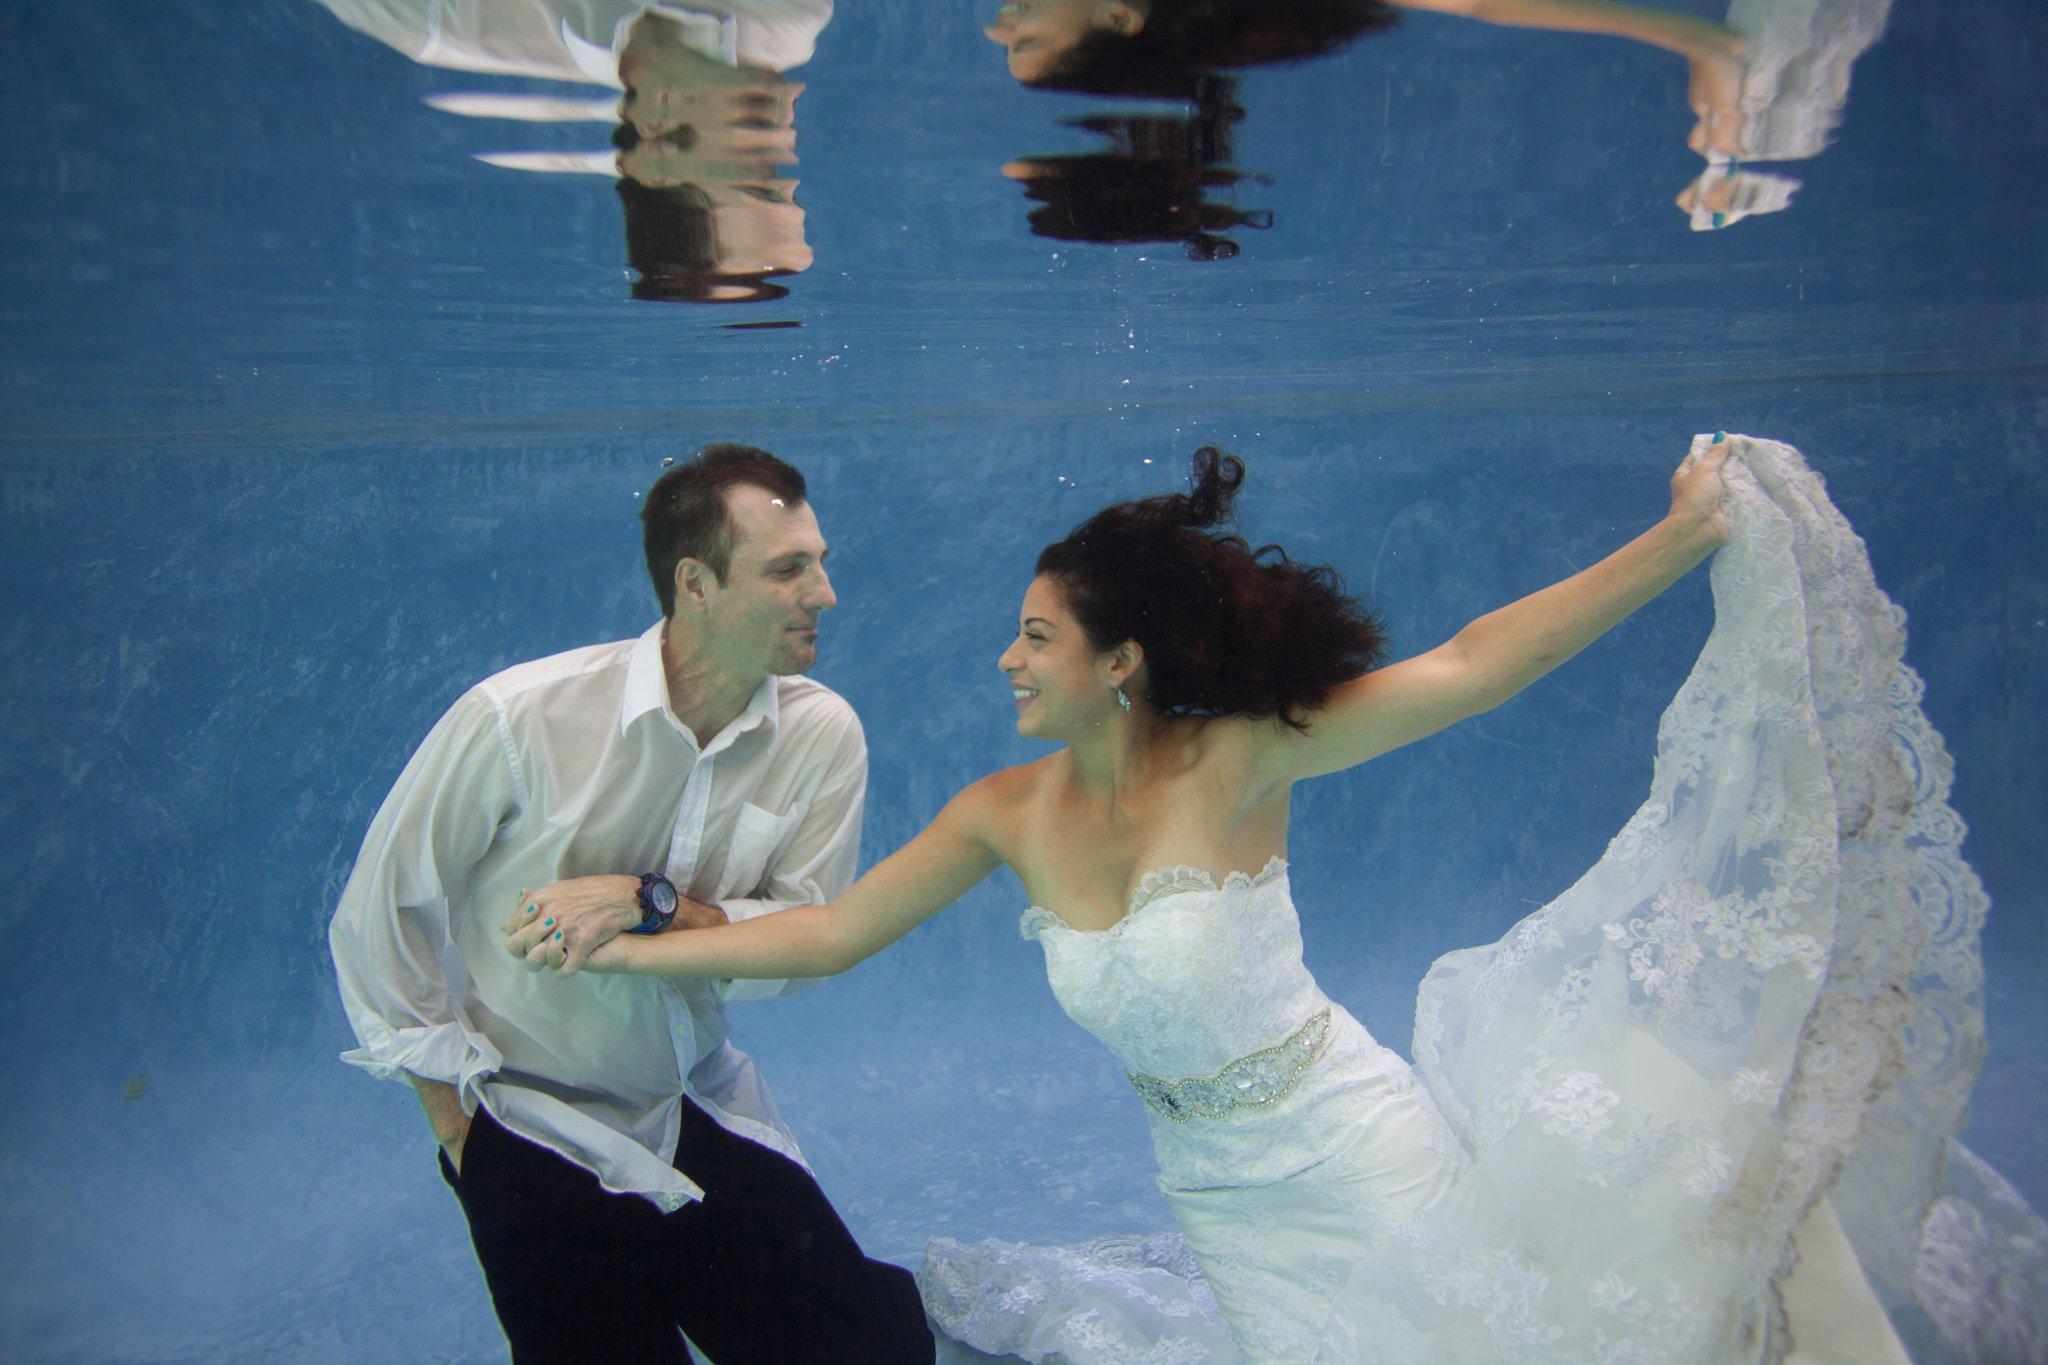 underwater trash the wedding dress photos in a pool Phoenix, AZ